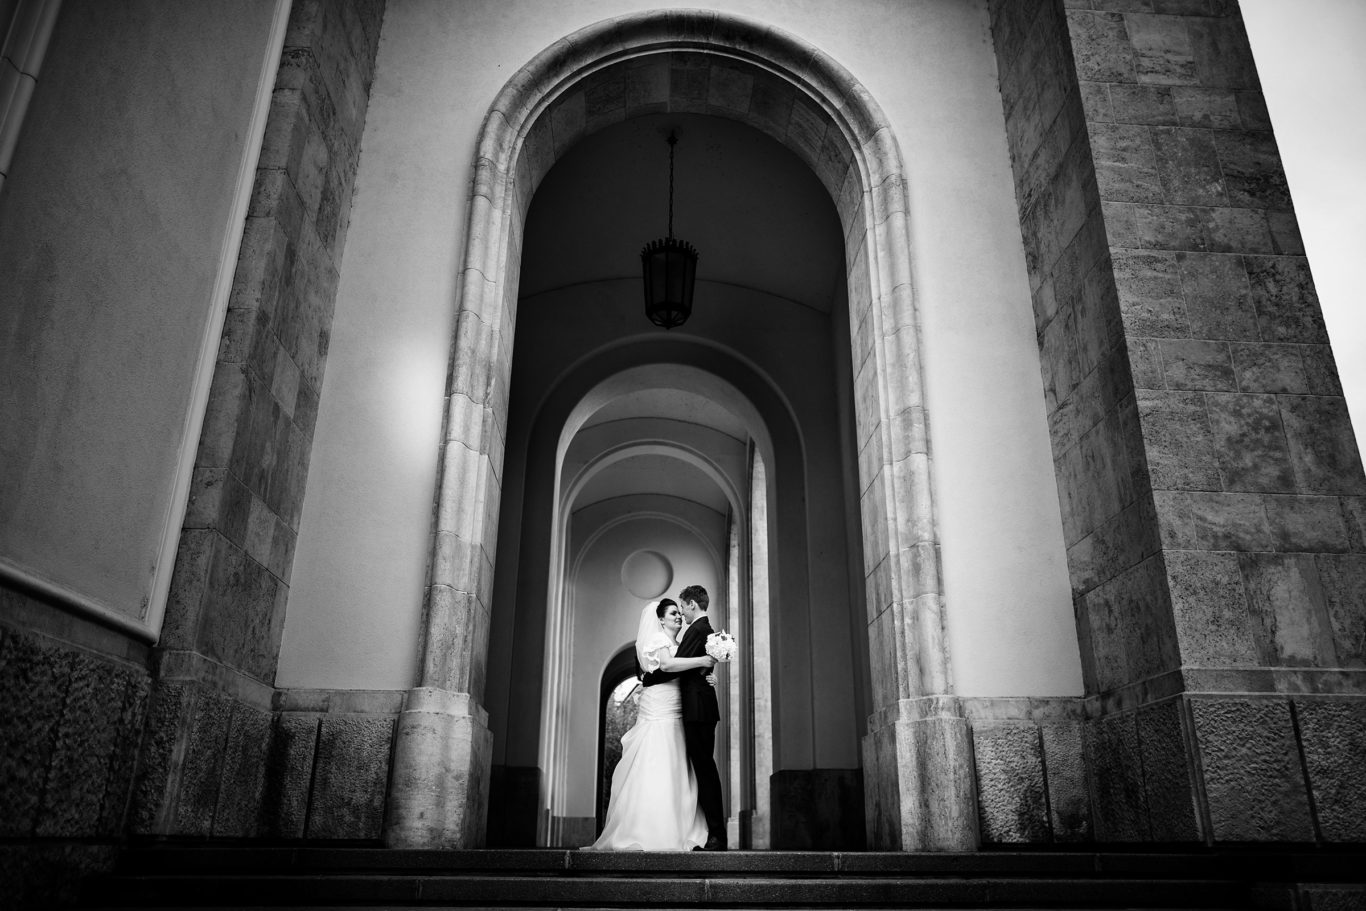 0336-Fotografie-nunta-Roxana-Costin-fotograf-Ciprian-Dumitrescu-DC1X0827-bw